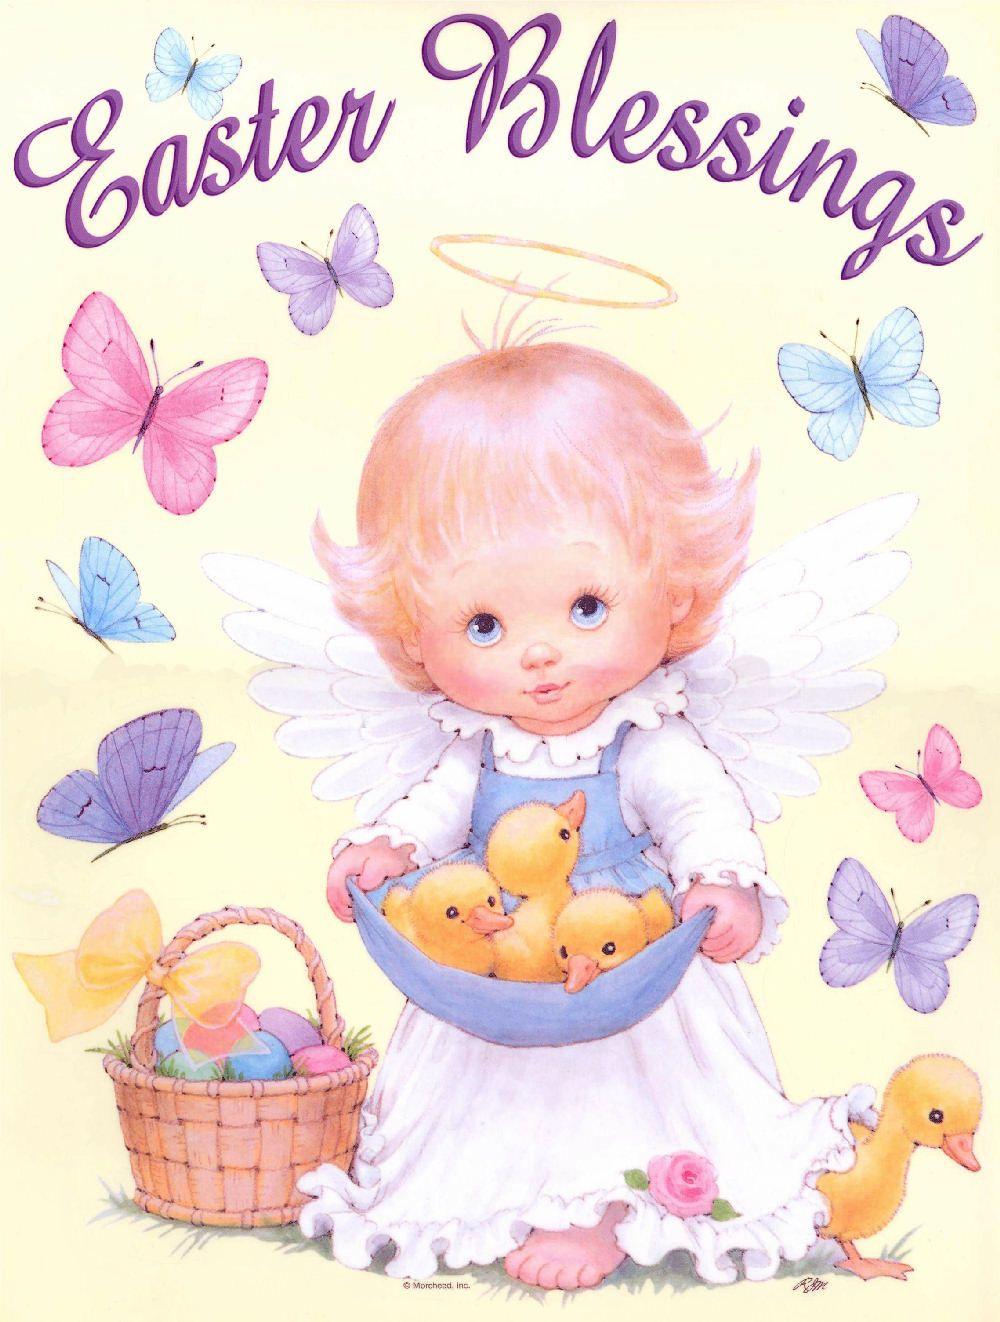 ruth morehead graphics | Ruth Morehead Pascua | para realizar tarjetas y manualidades | tamaño ...